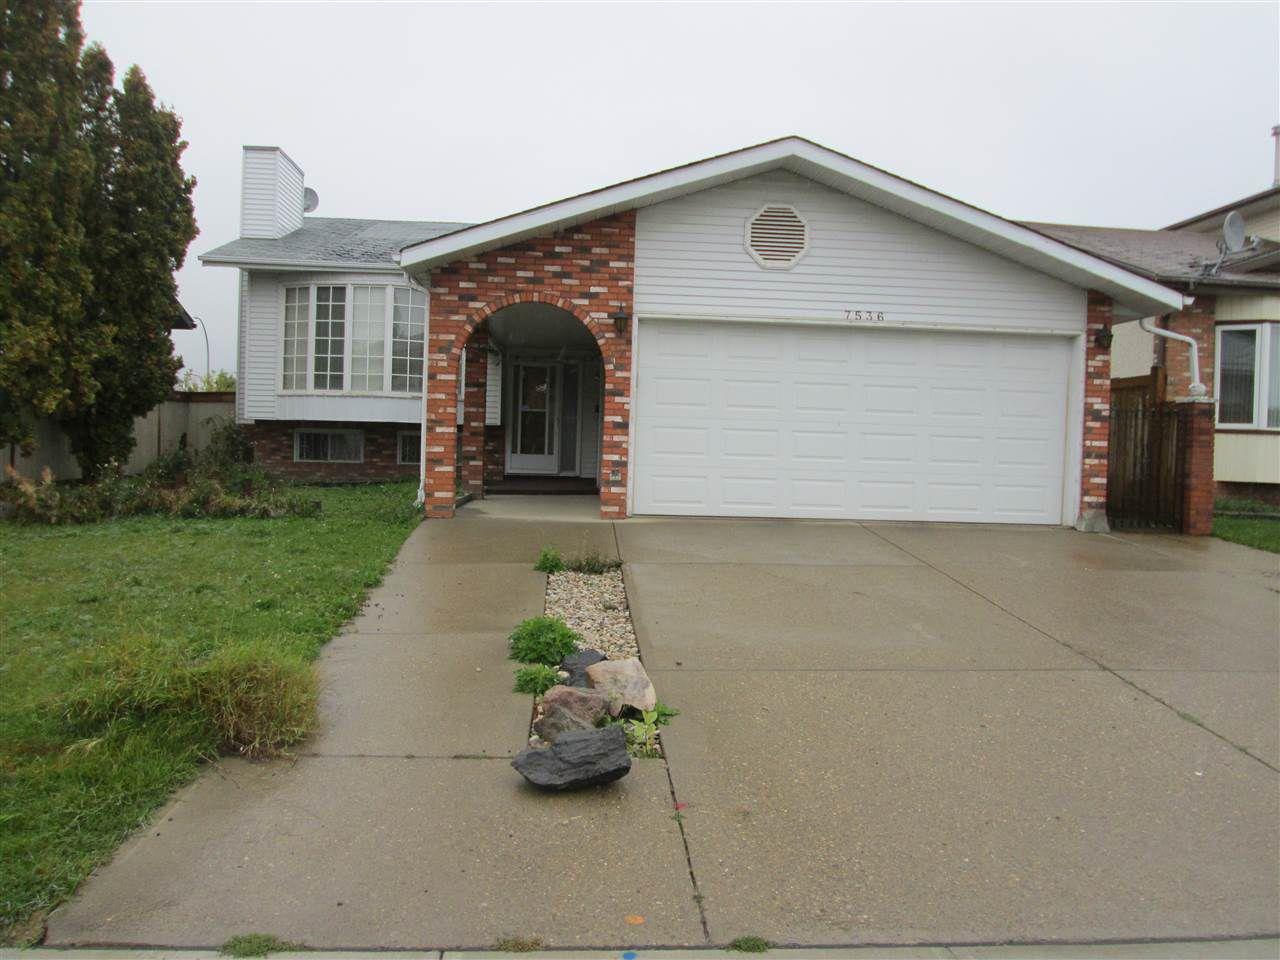 Main Photo: 7536 152C Avenue in Edmonton: Zone 02 House for sale : MLS®# E4129674